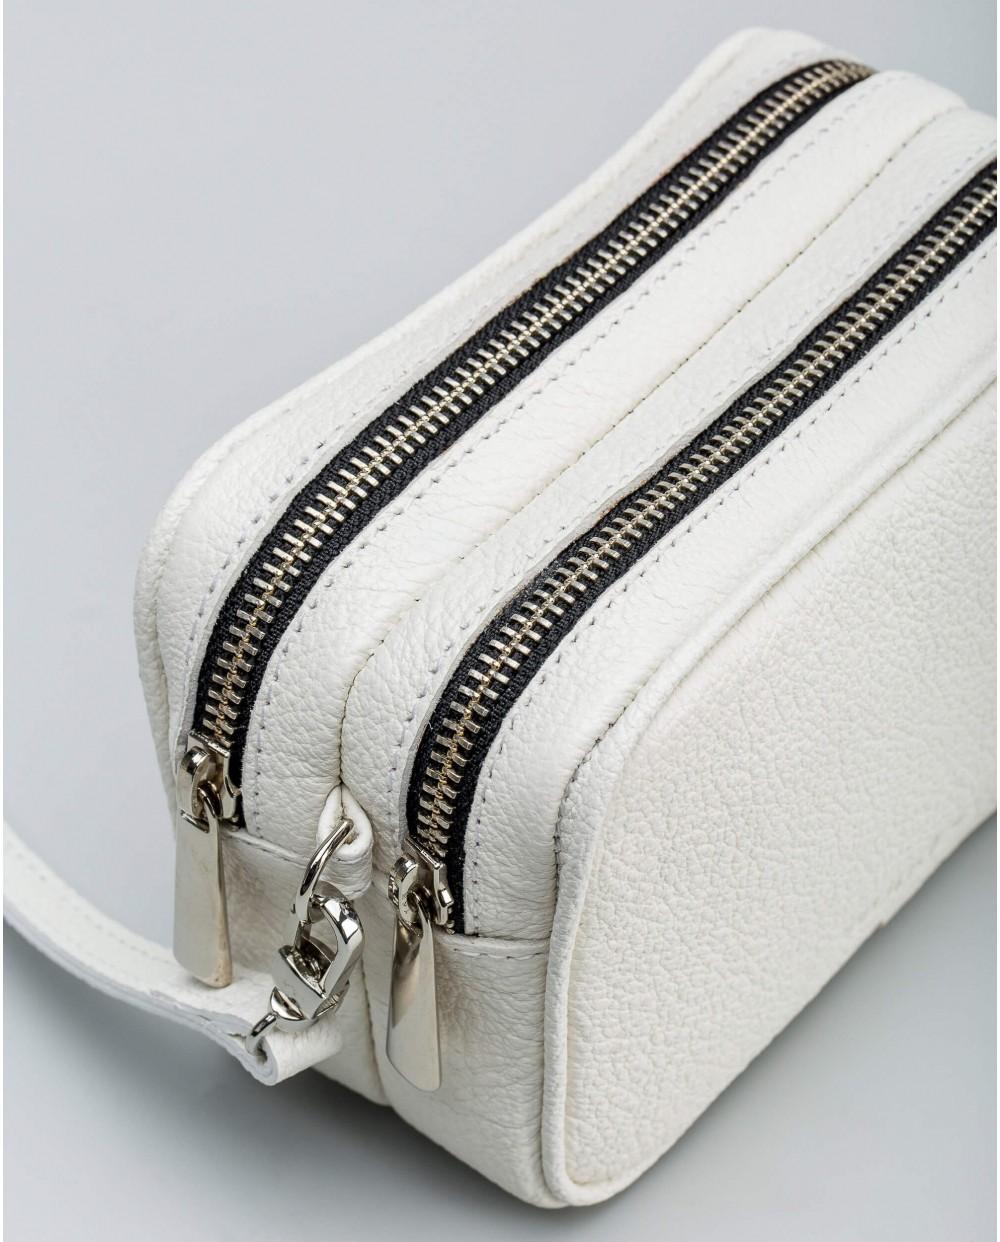 Wonders-Women-Mini handbag in pebble leather